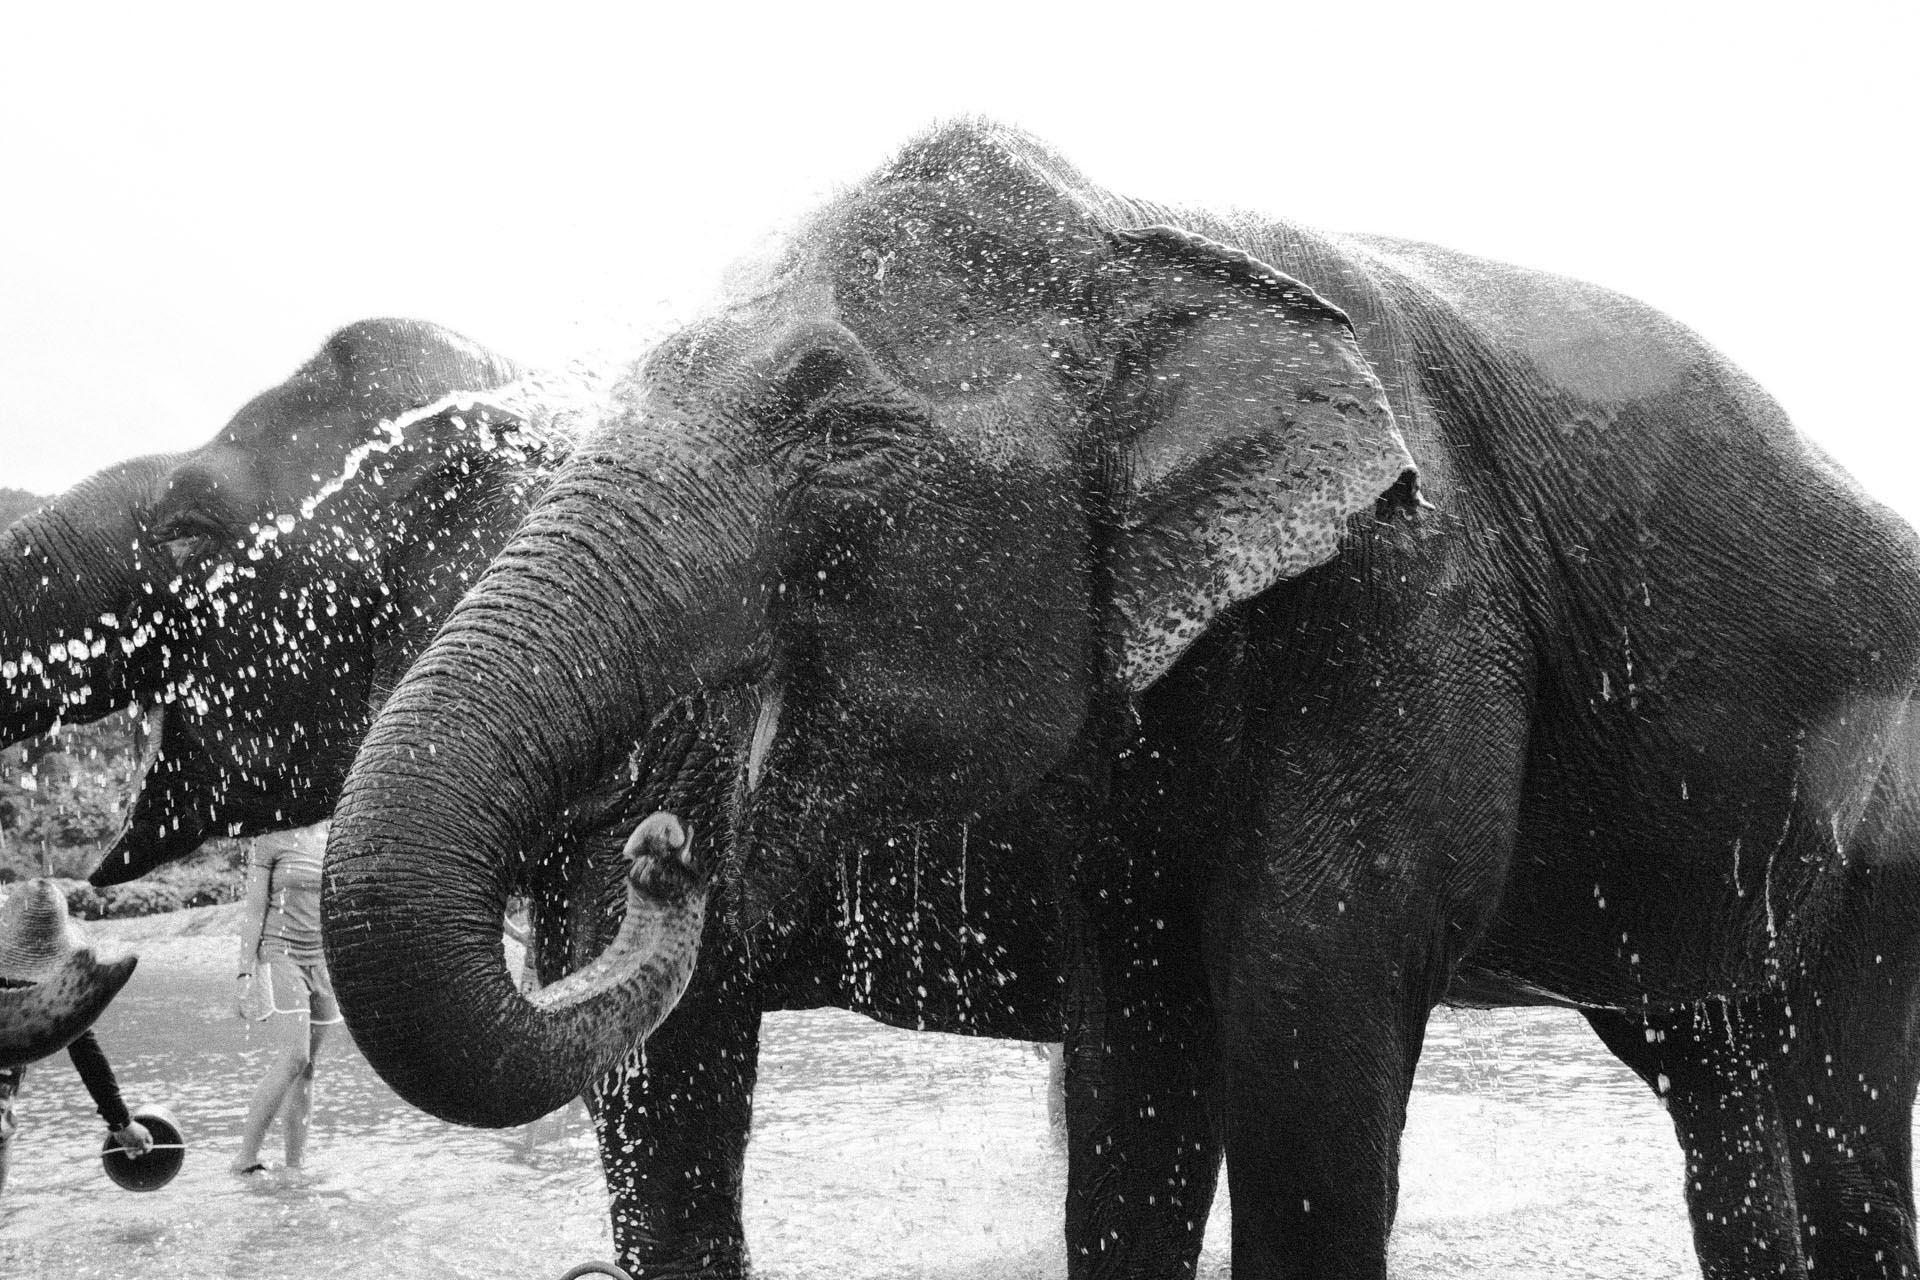 Ren Photography_Elephants_0011.jpg